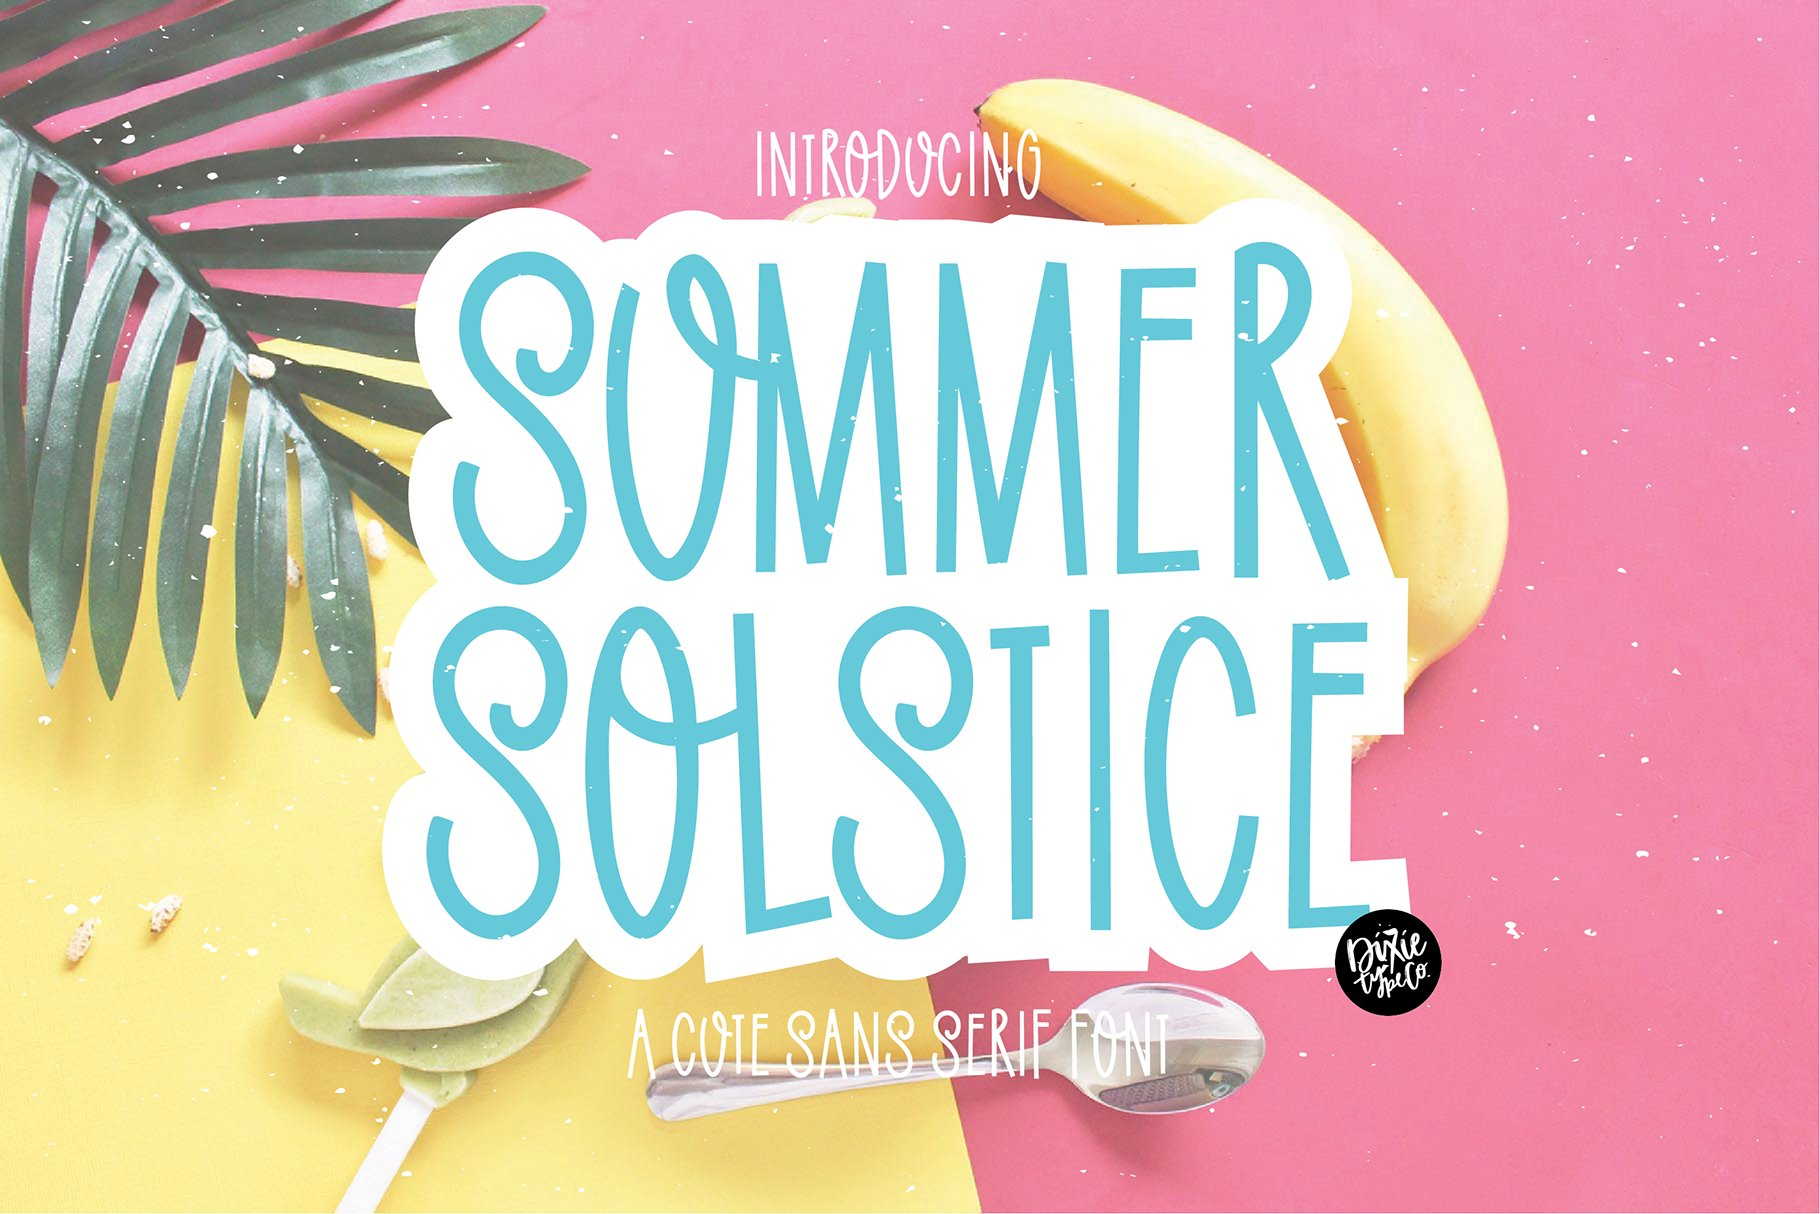 SUMMER SOLSTICE a Cute Sans Serif Font example image 1